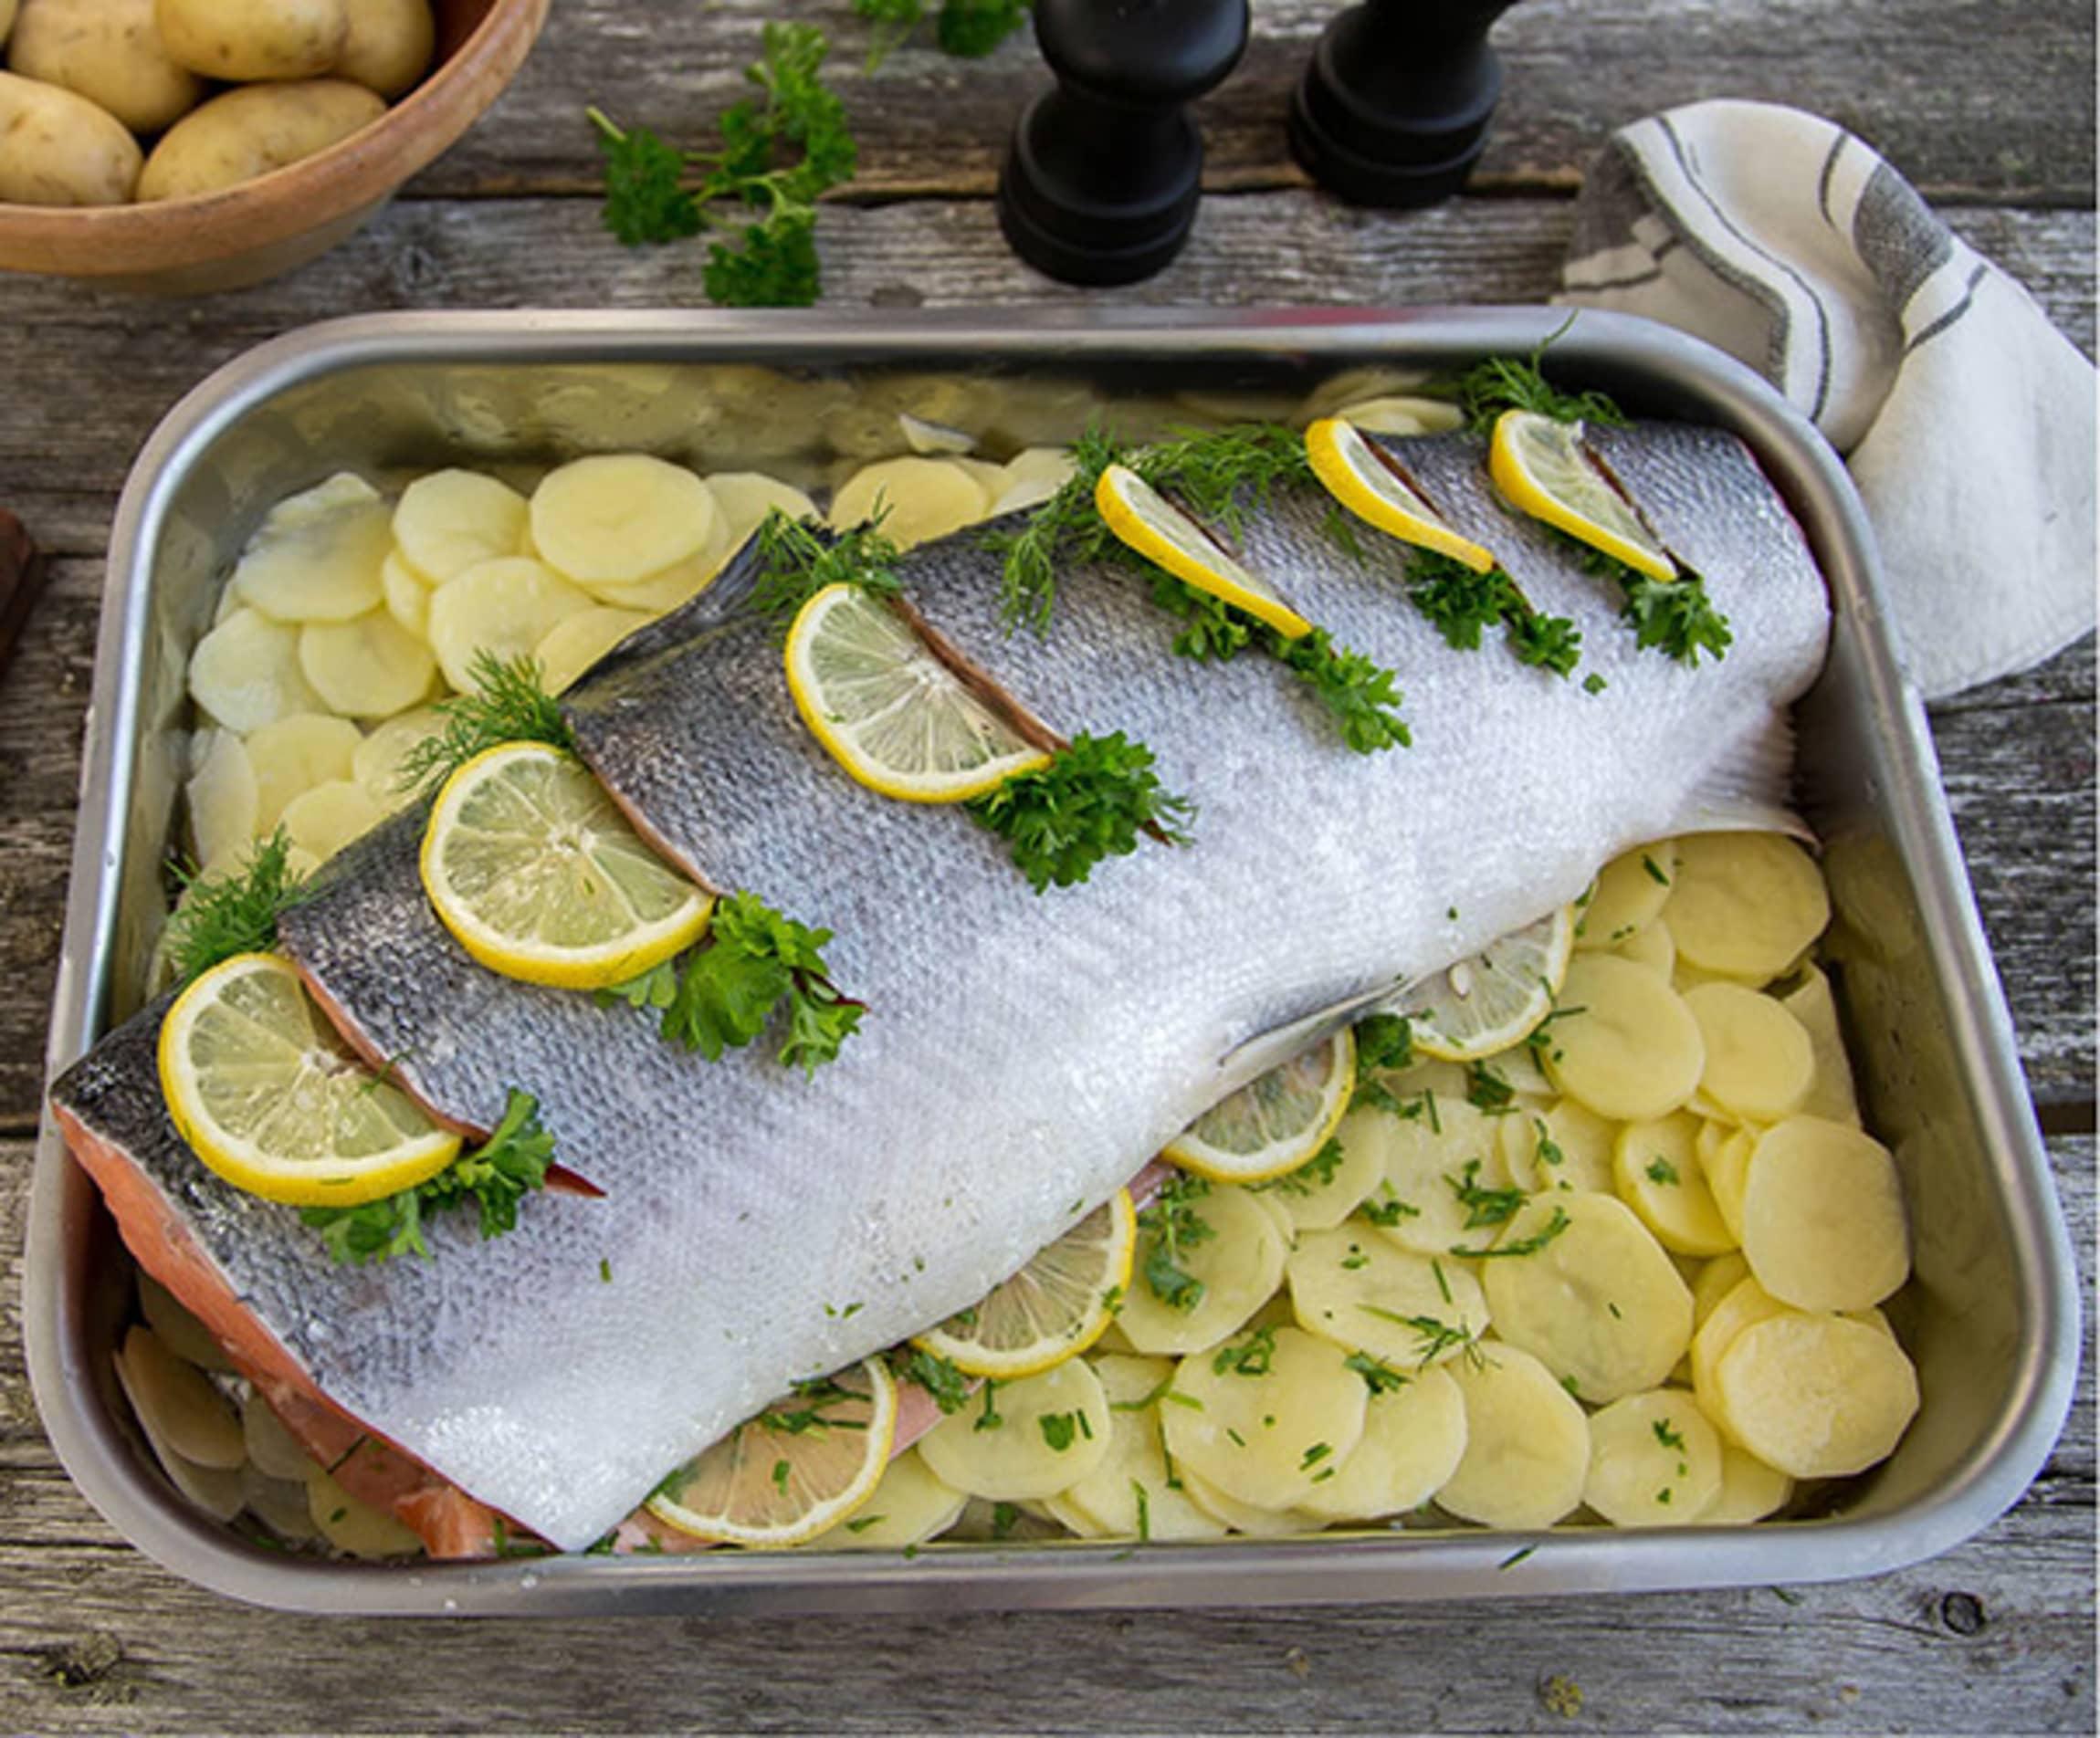 Hel laks med sitron, urter og potetskiver.